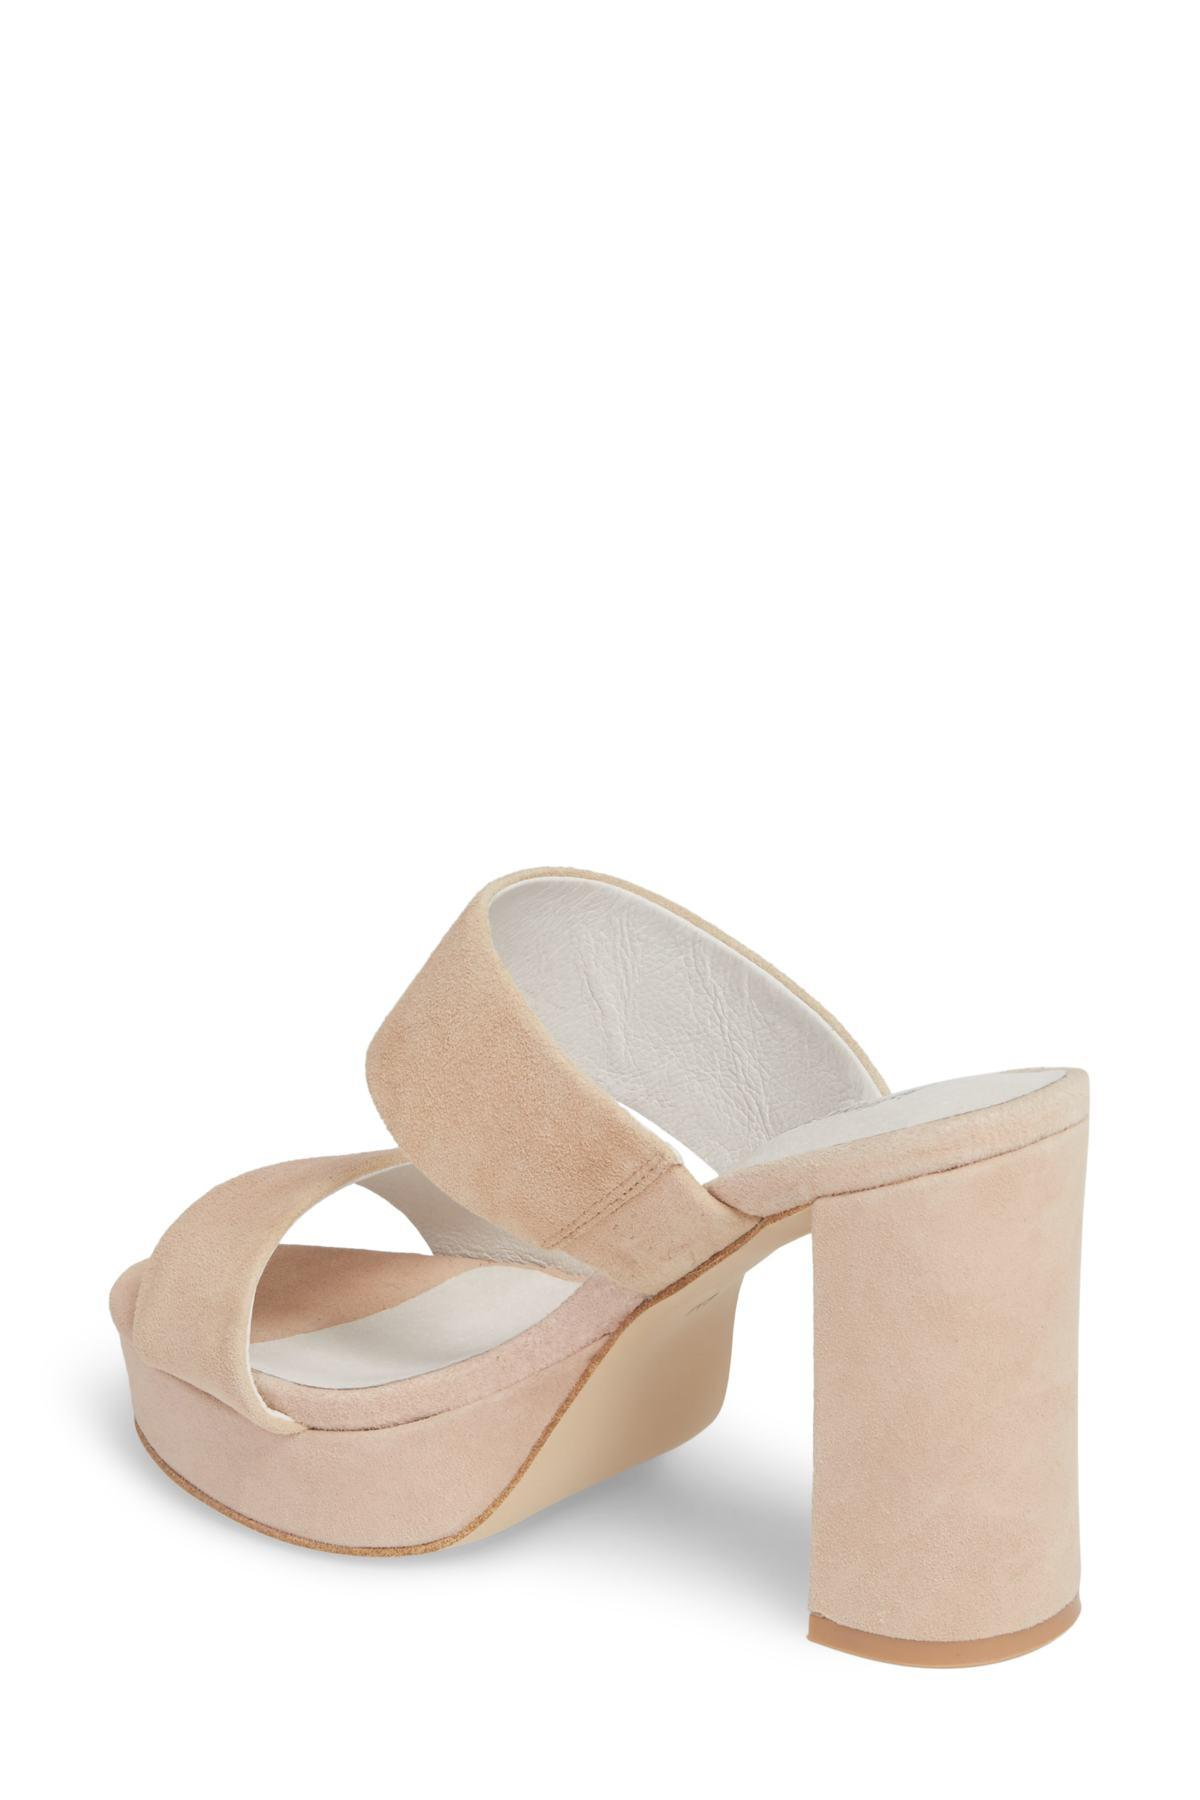 591088e9dcb0 Lyst - Jeffrey Campbell Adriana Double Band Platform Sandal